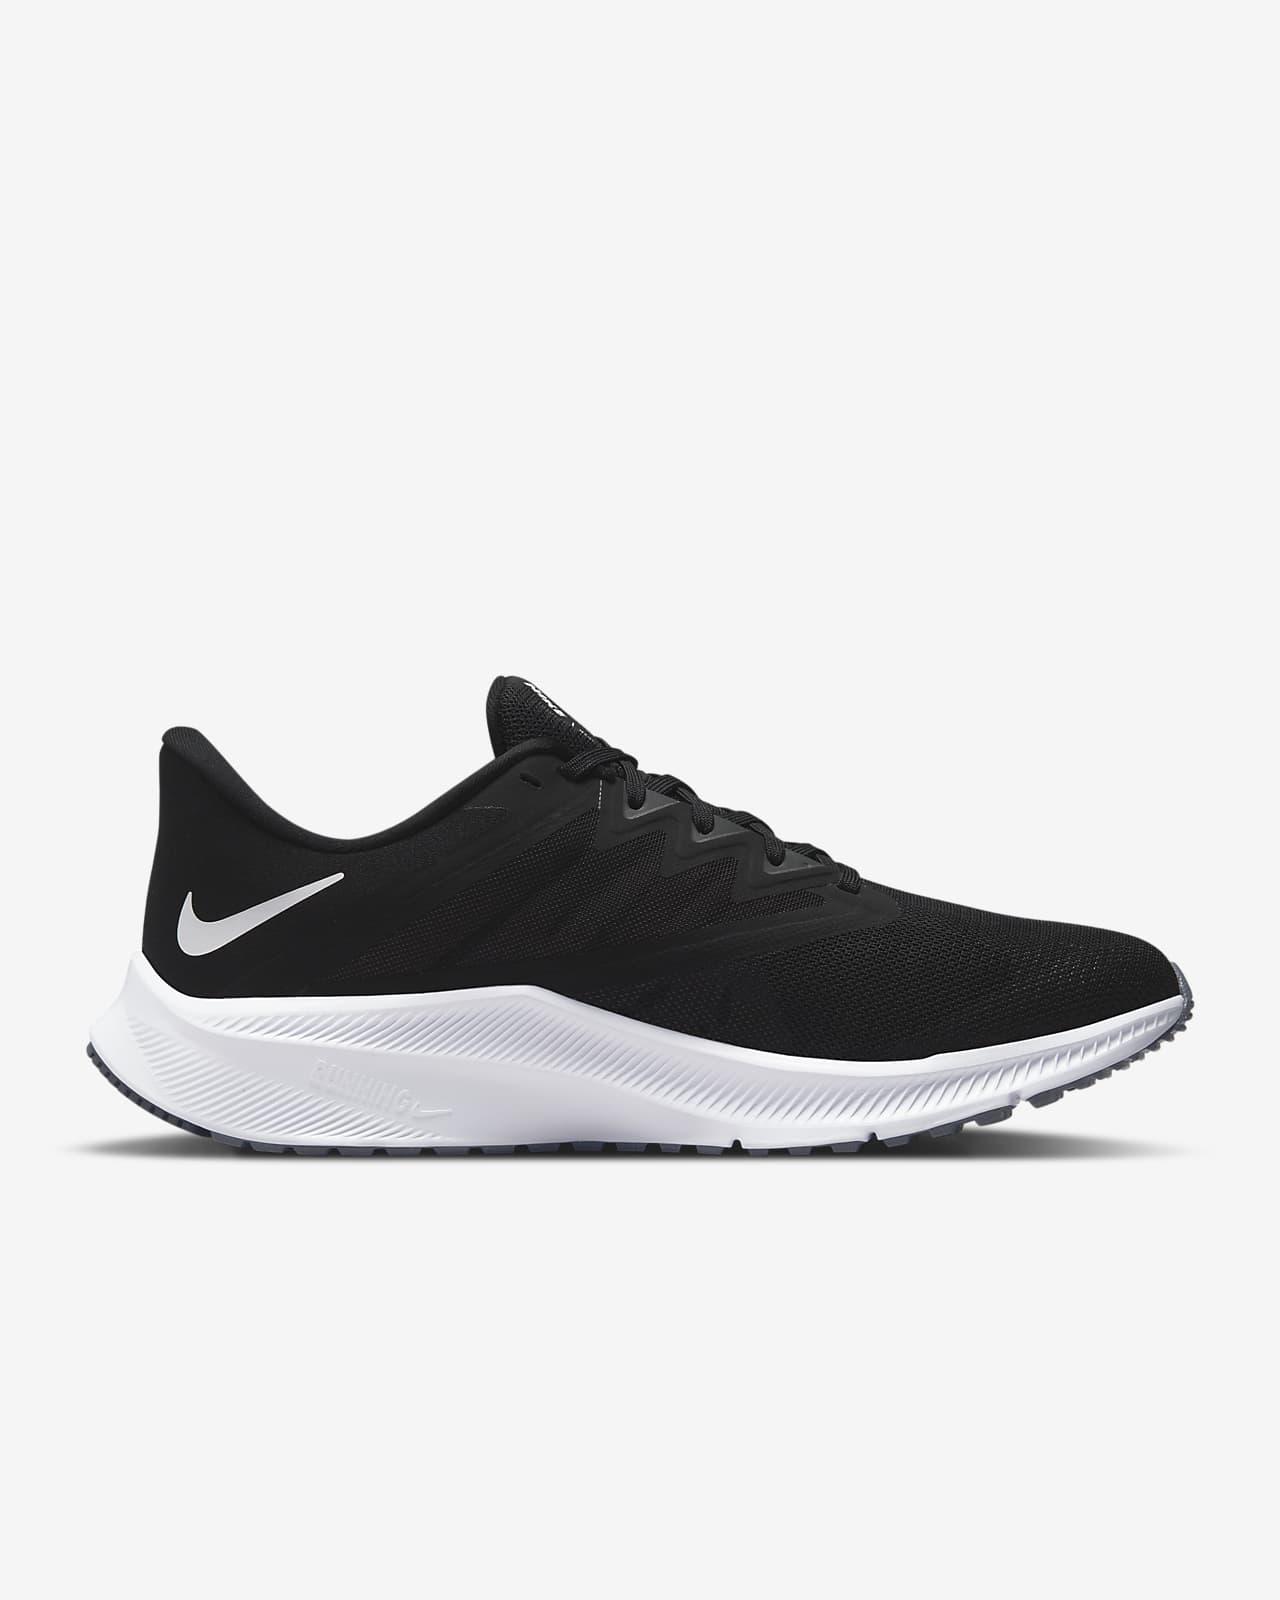 Chaussure de running Nike Quest 3 pour Homme